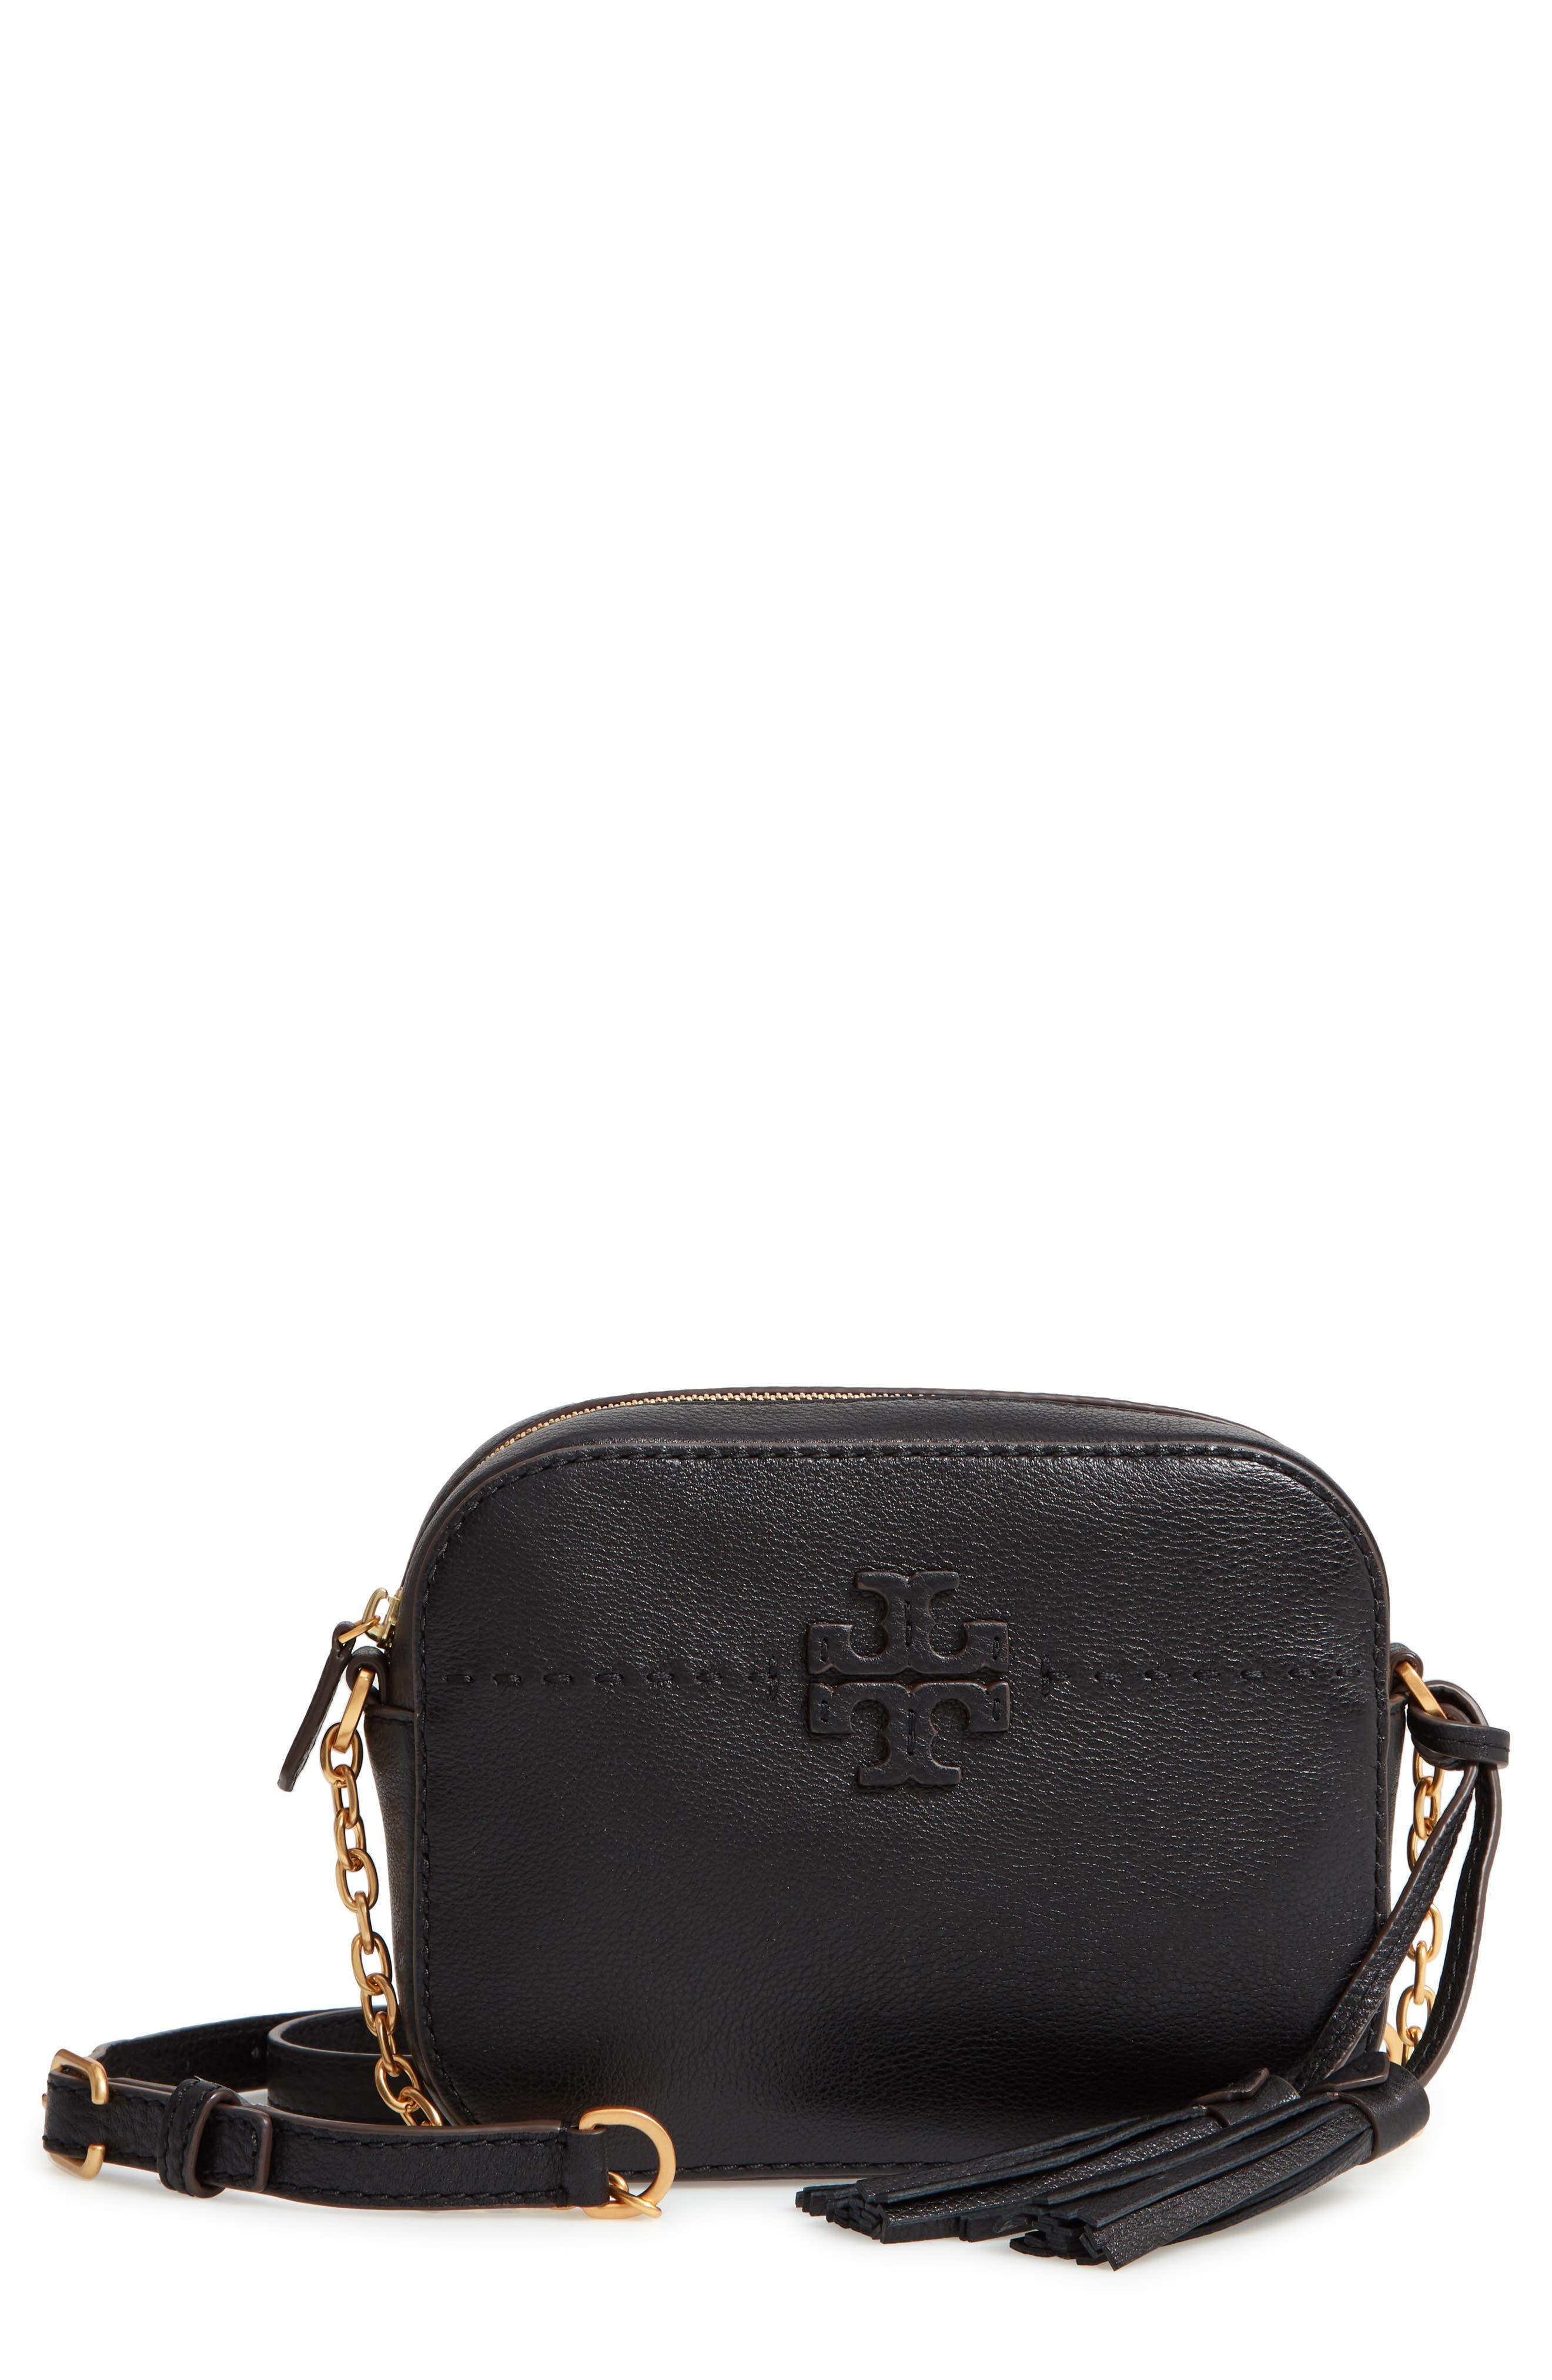 McGraw Leather Camera Bag,                             Main thumbnail 1, color,                             BLACK